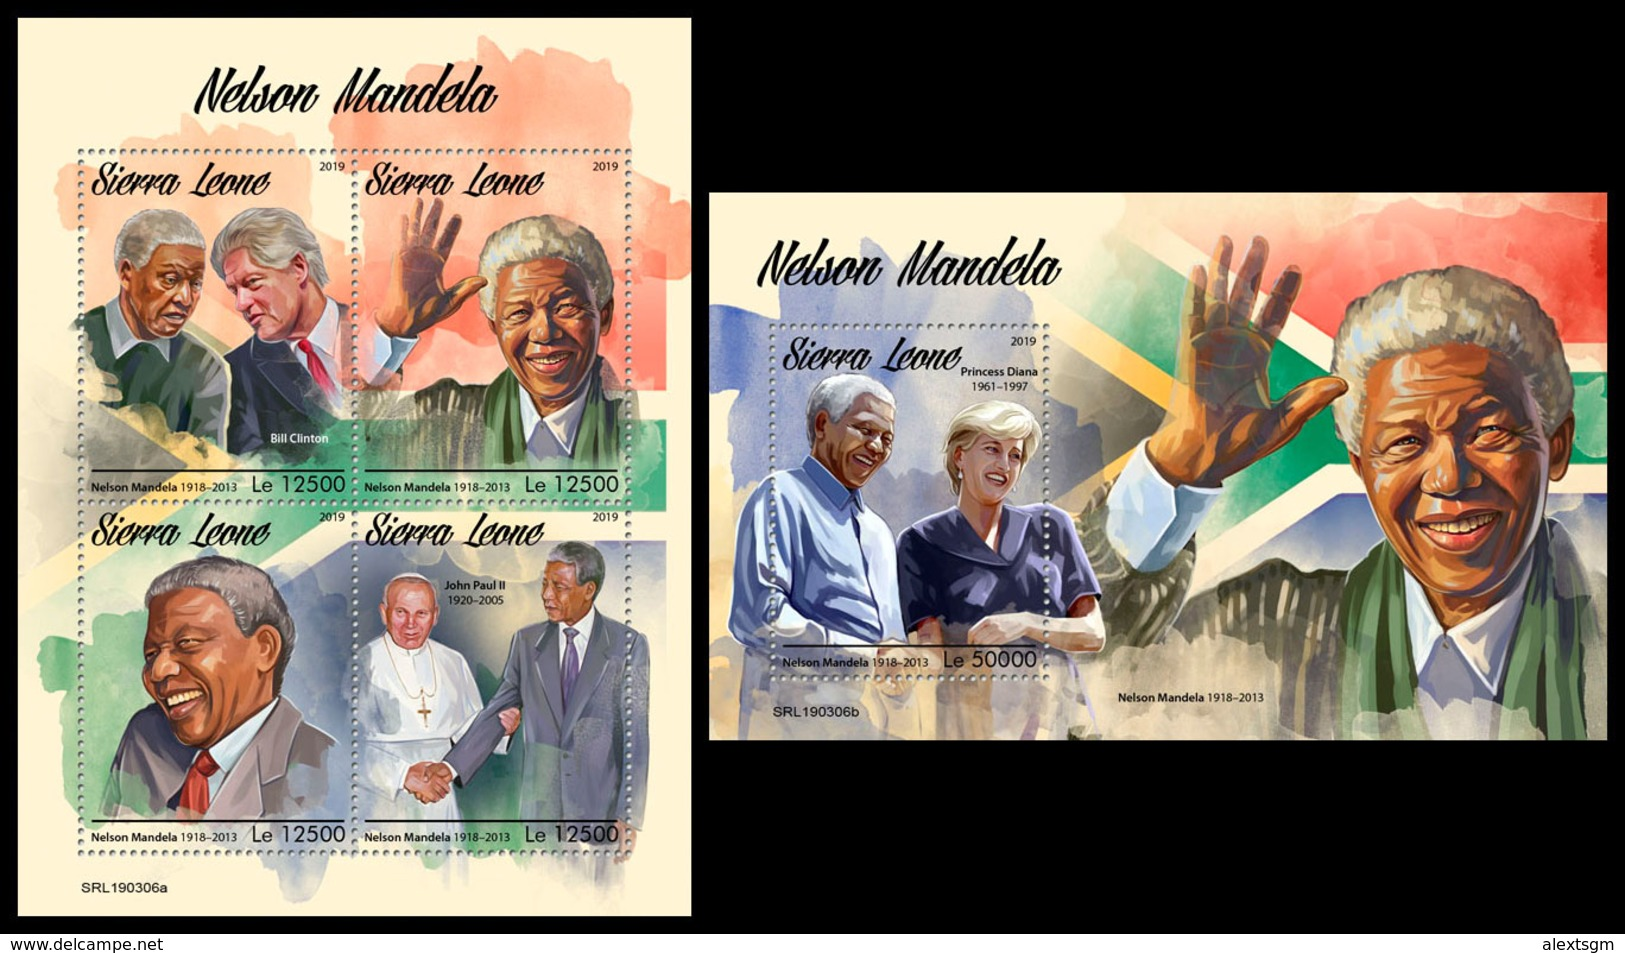 SIERRA LEONE 2019 - Nelson Mandela. M/S + S/S Official Issue. - Beroemde Personen